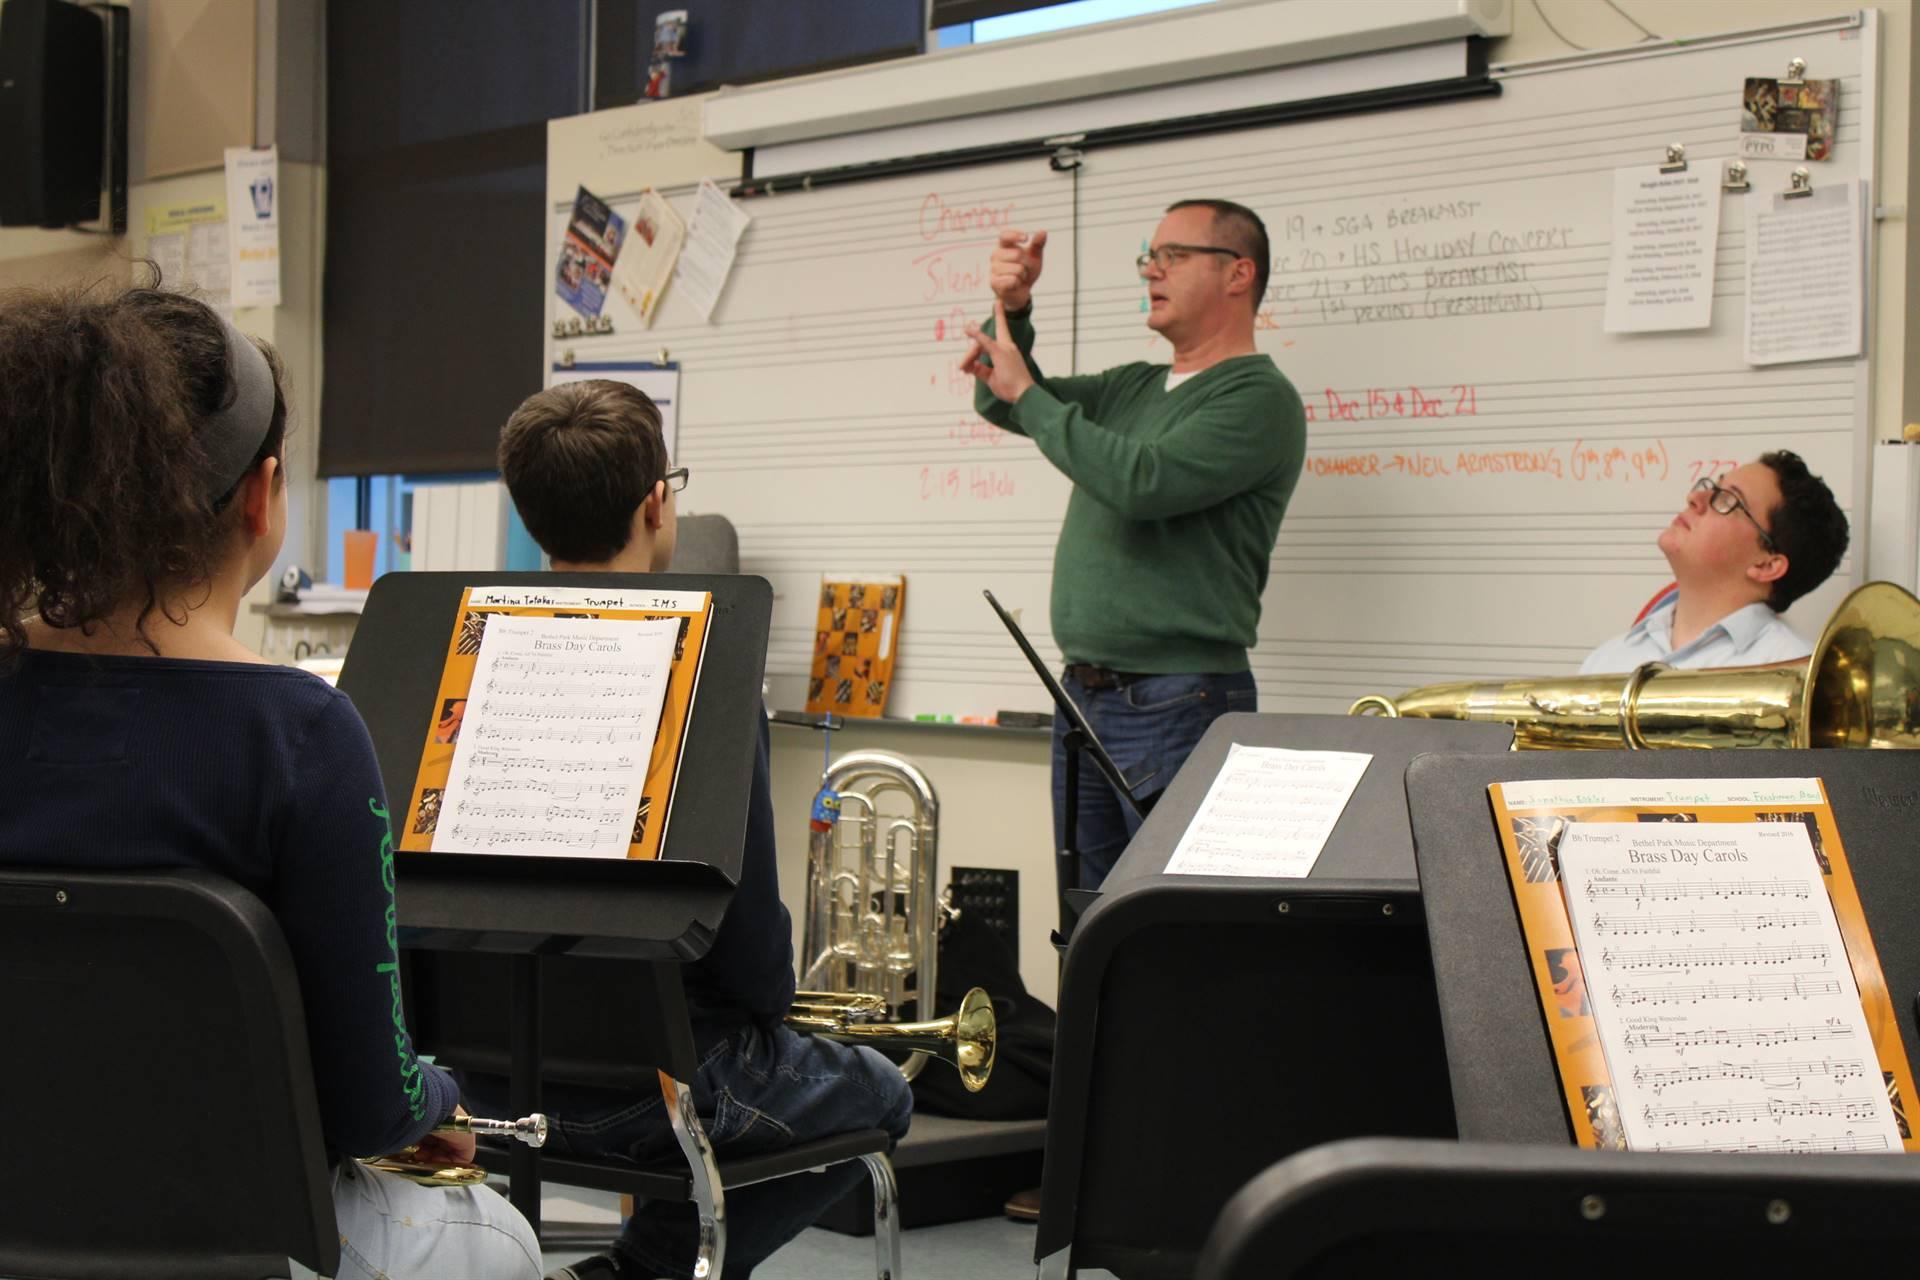 Mr. LaDuke leads the Master Class